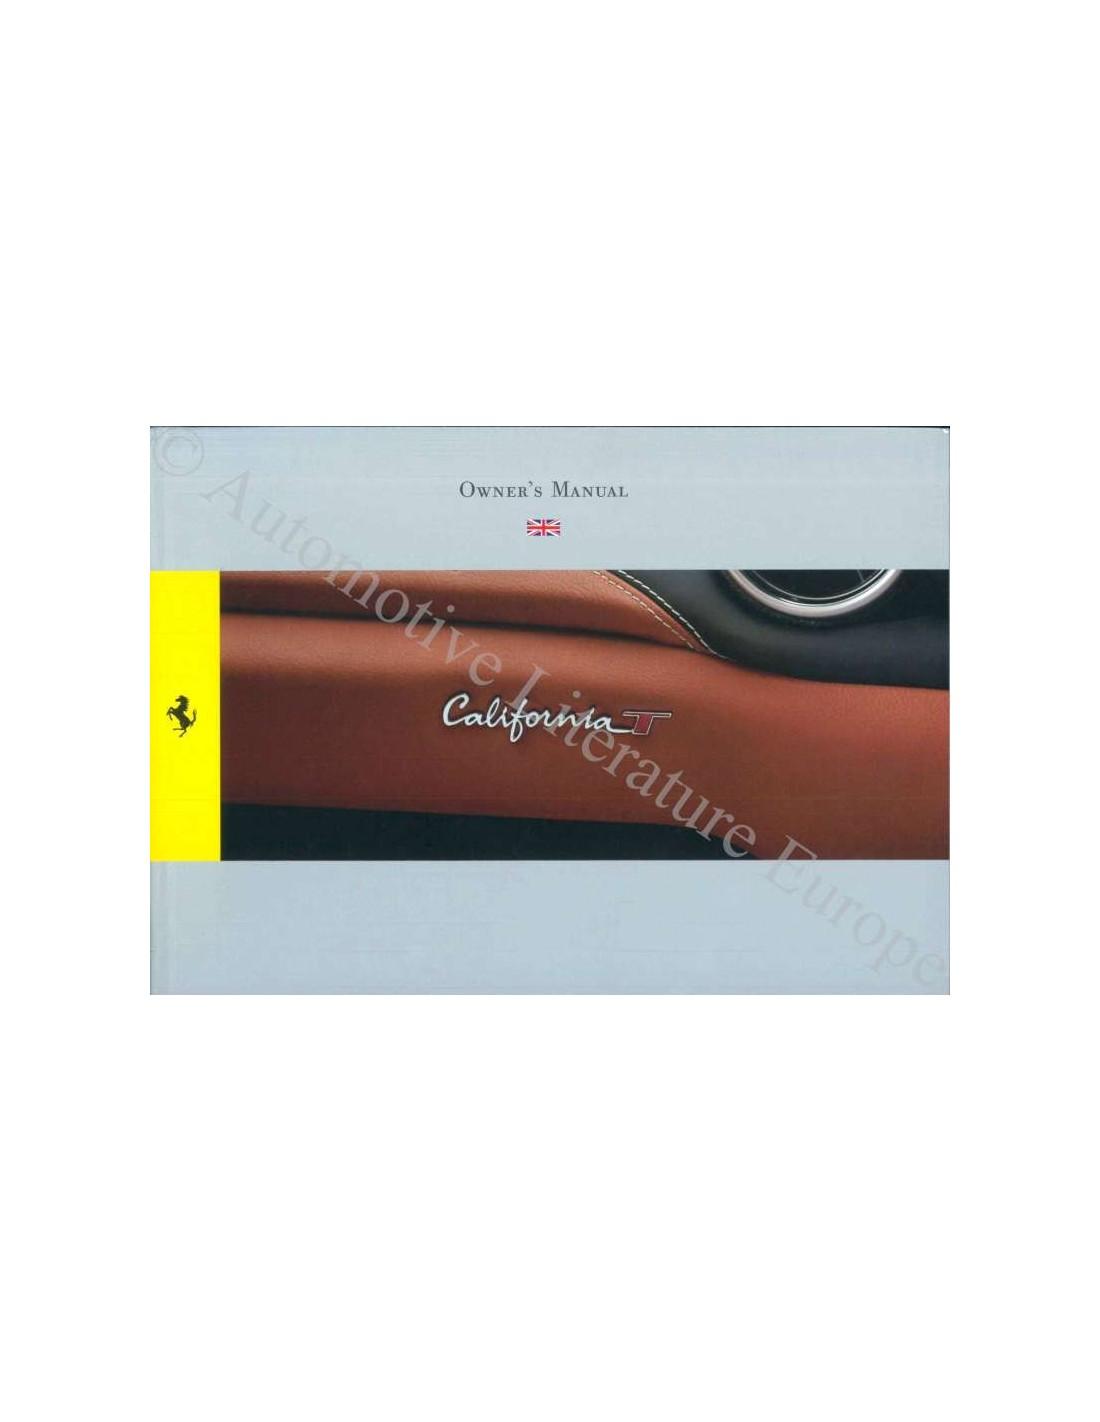 Ferrari Repair Manuals: 2014 FERRARI CALIFORNIA T OWNER'S MANUAL ENGLISH